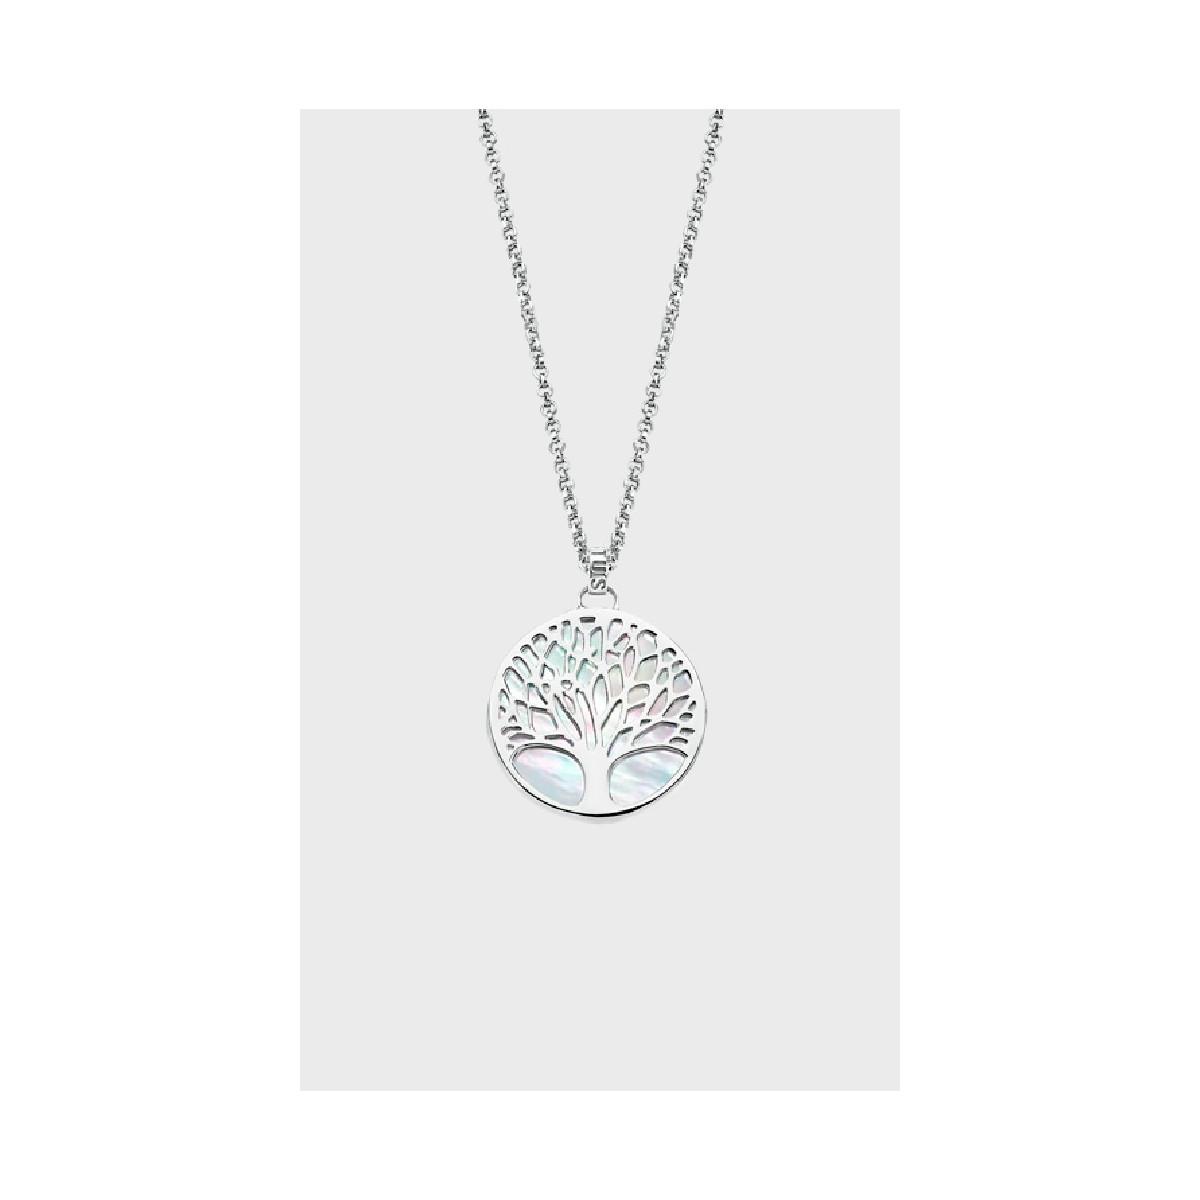 Lotus Silver Collar Sra.arbol.nacar - LP1678-1/1